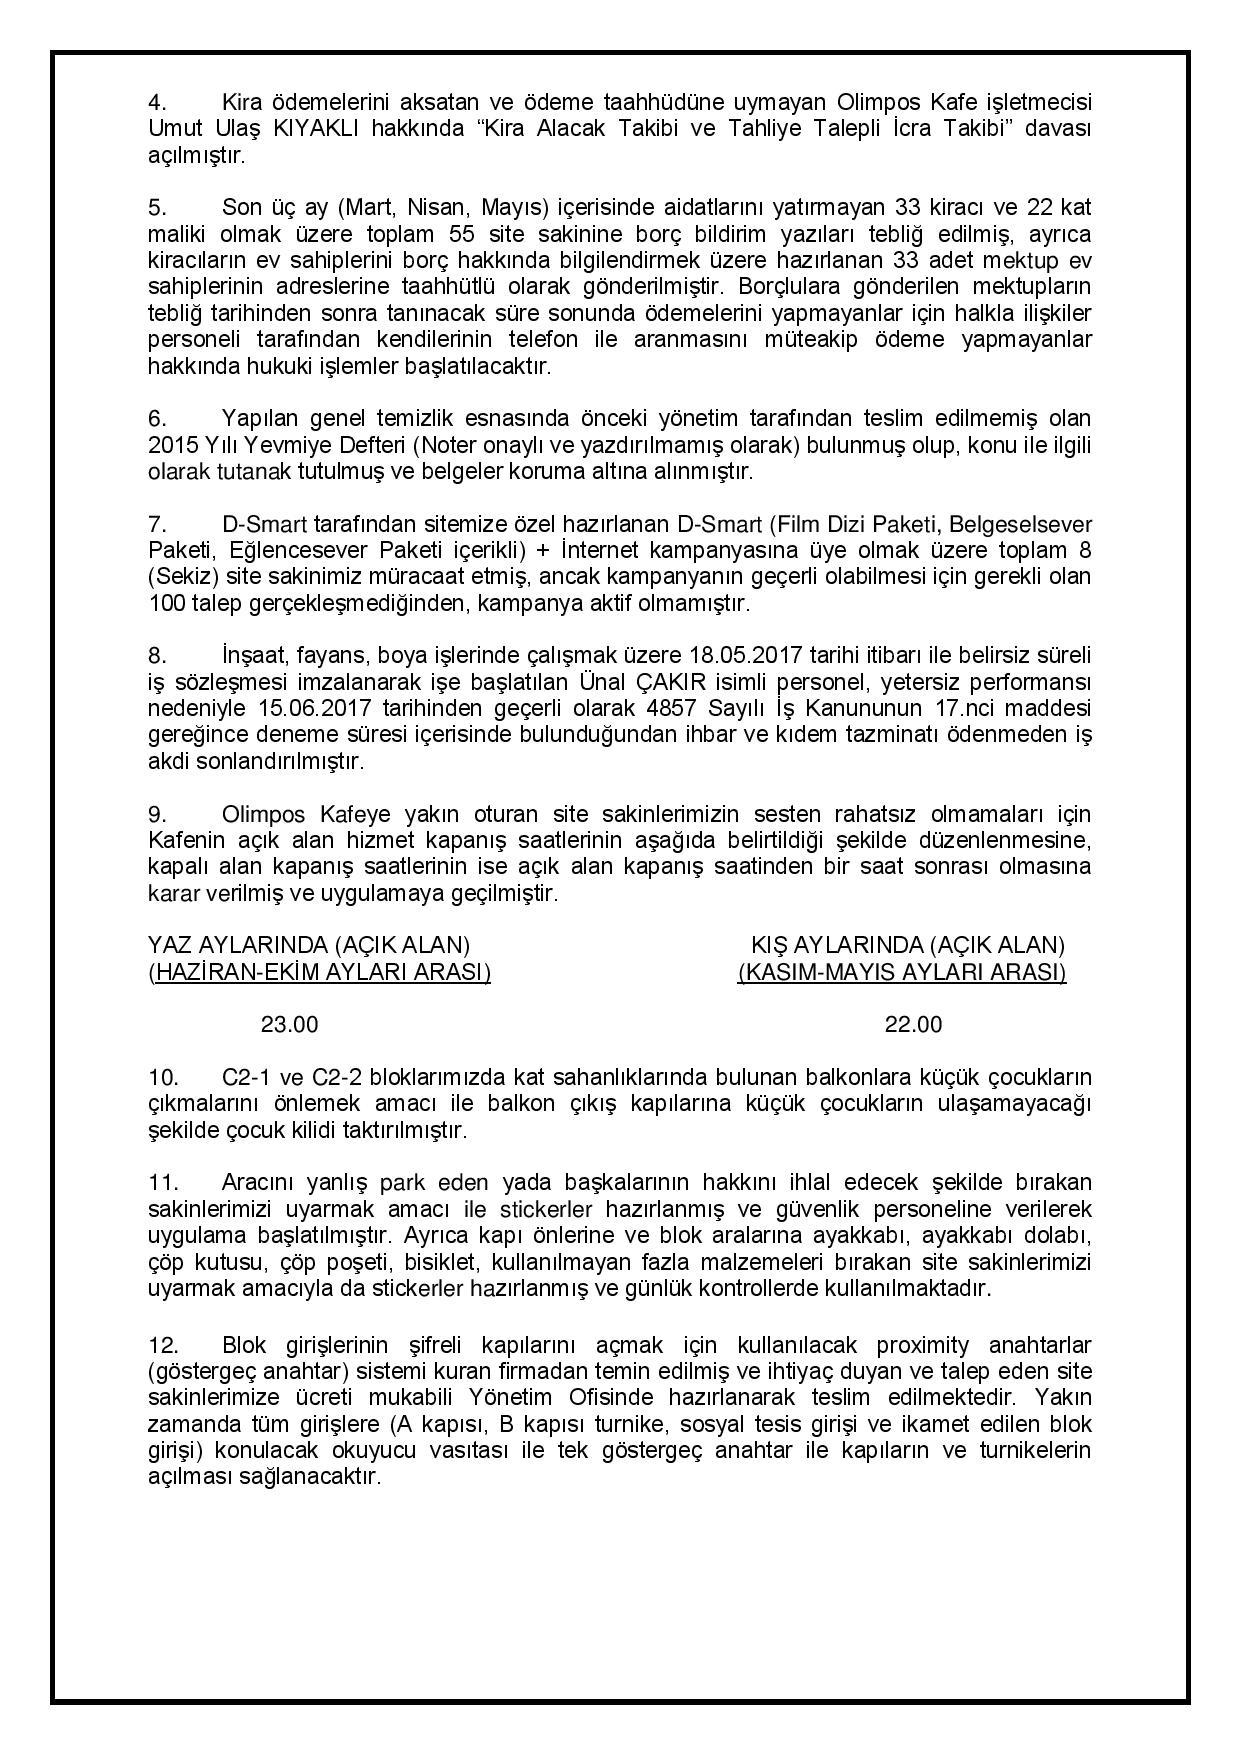 01.06.2017 HAZİRAN-2017 BÜLTEN 002